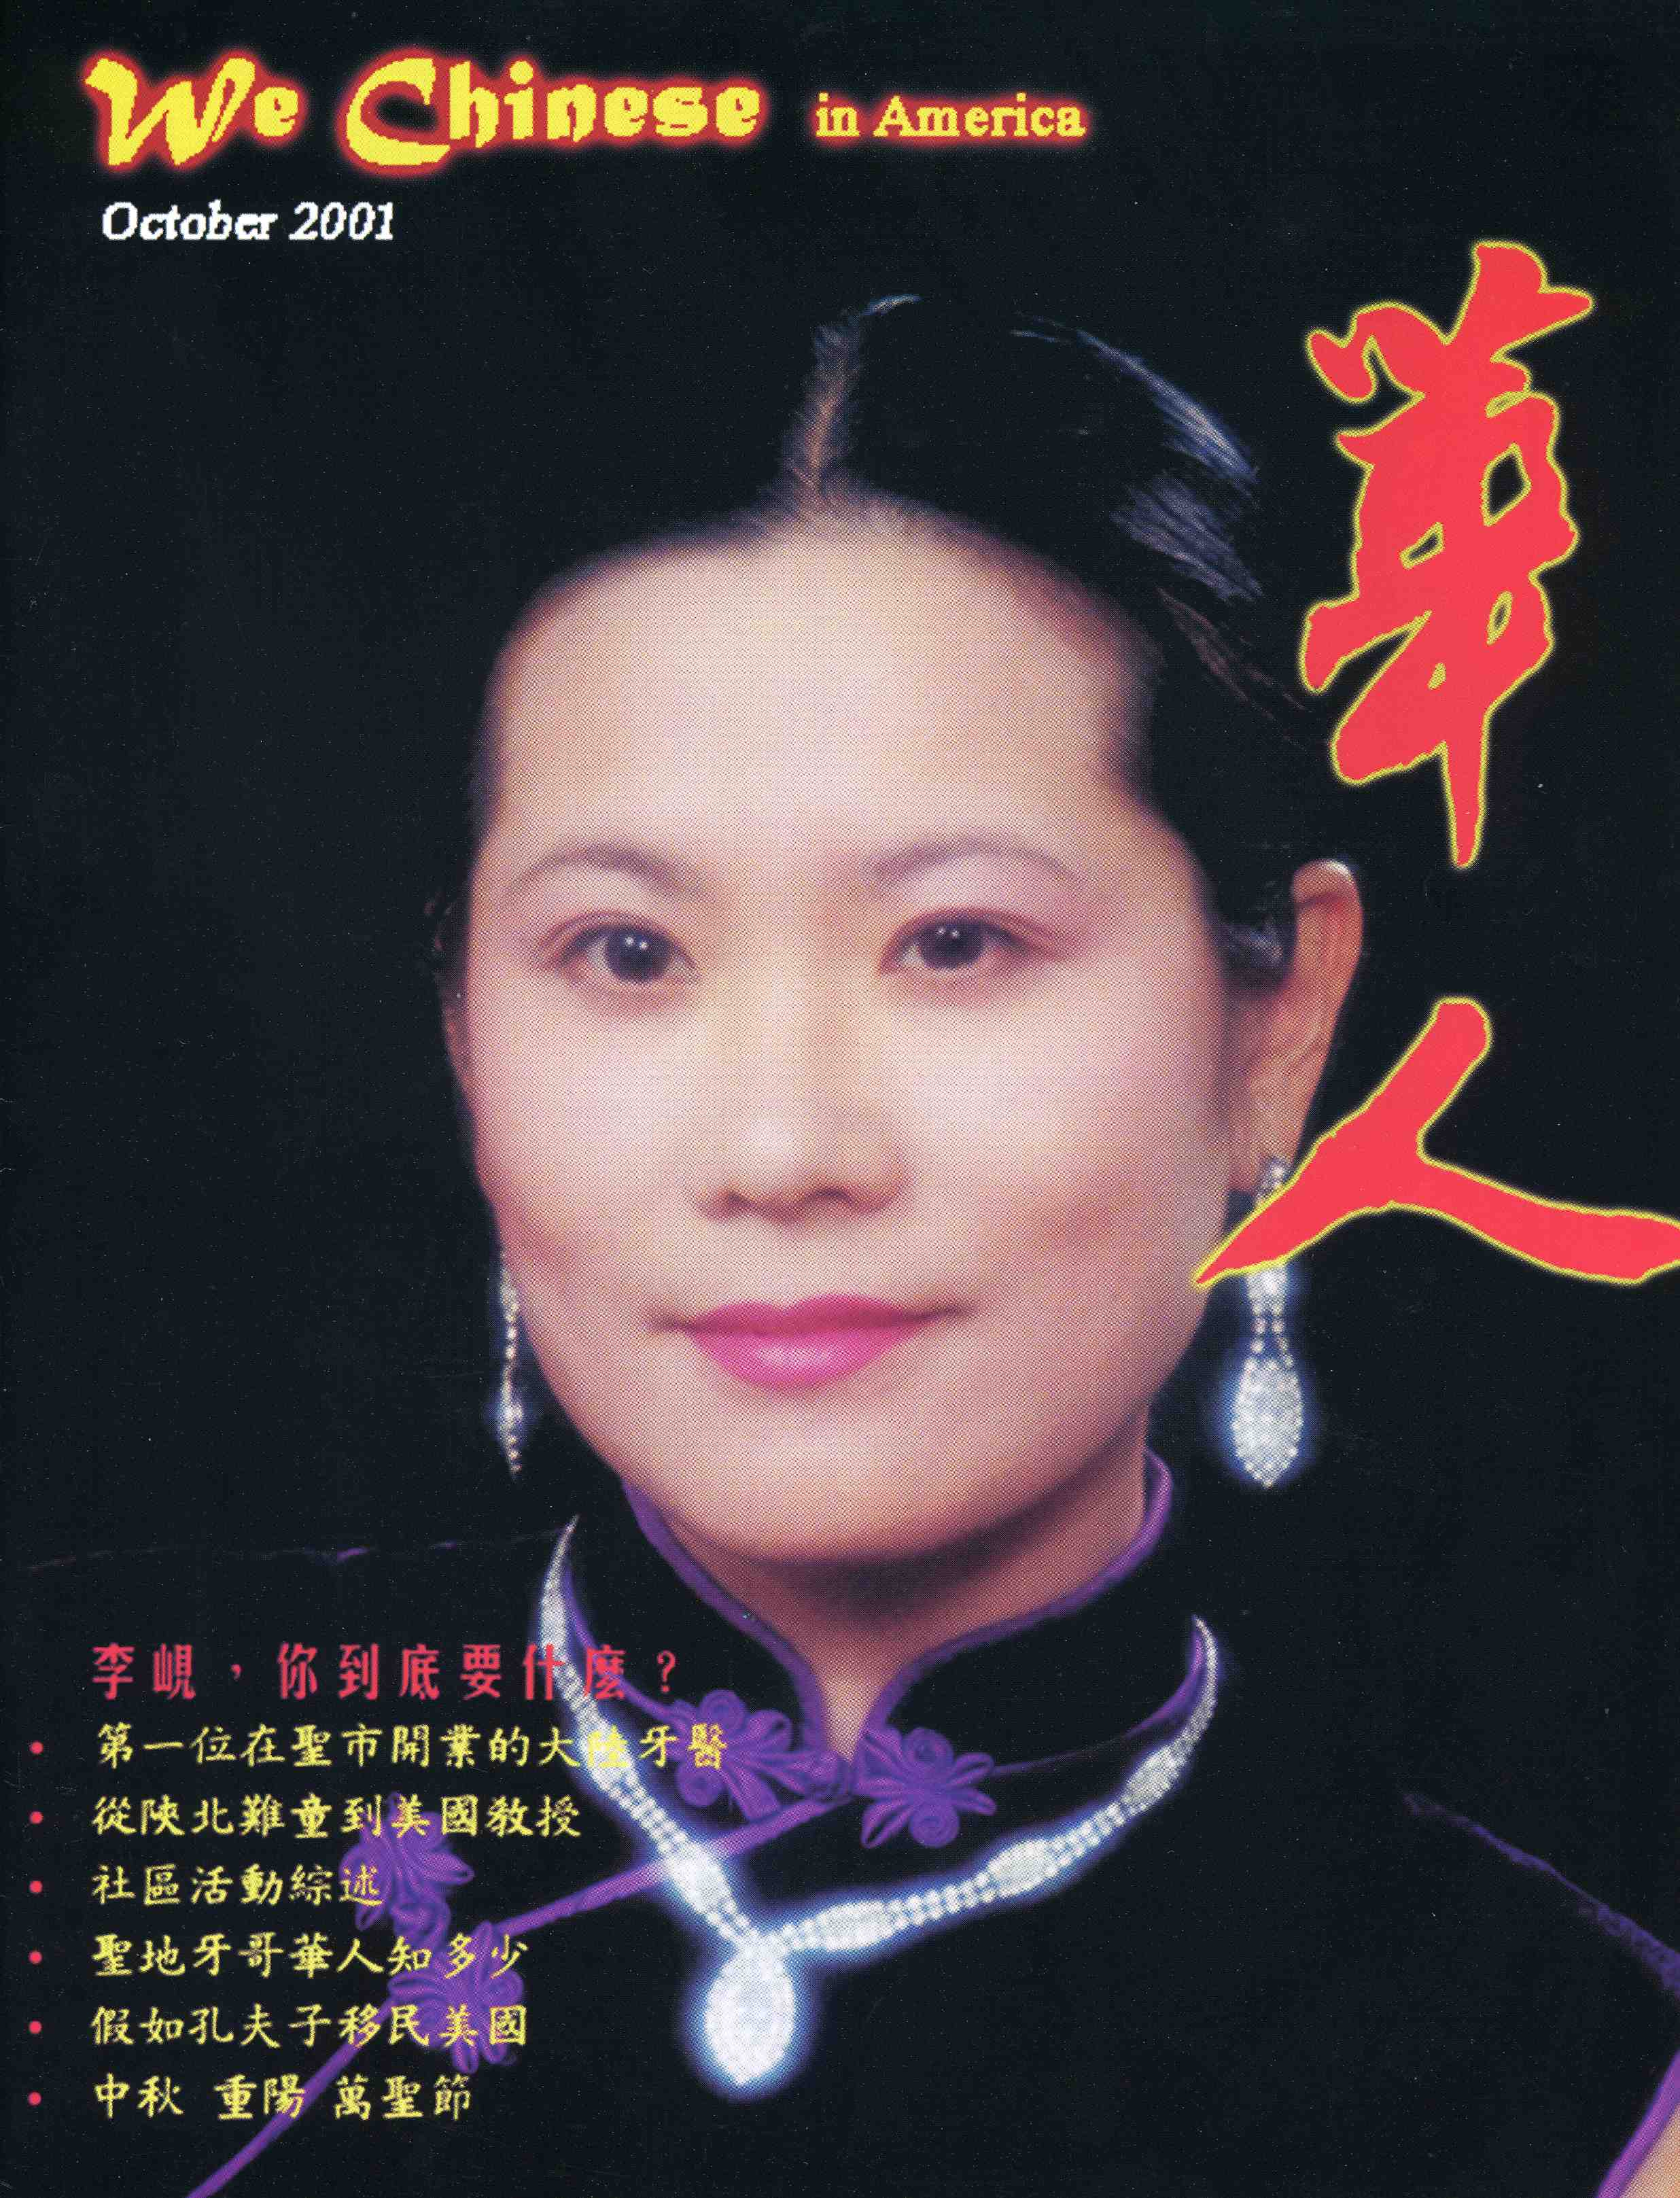 lixian moon004.jpg